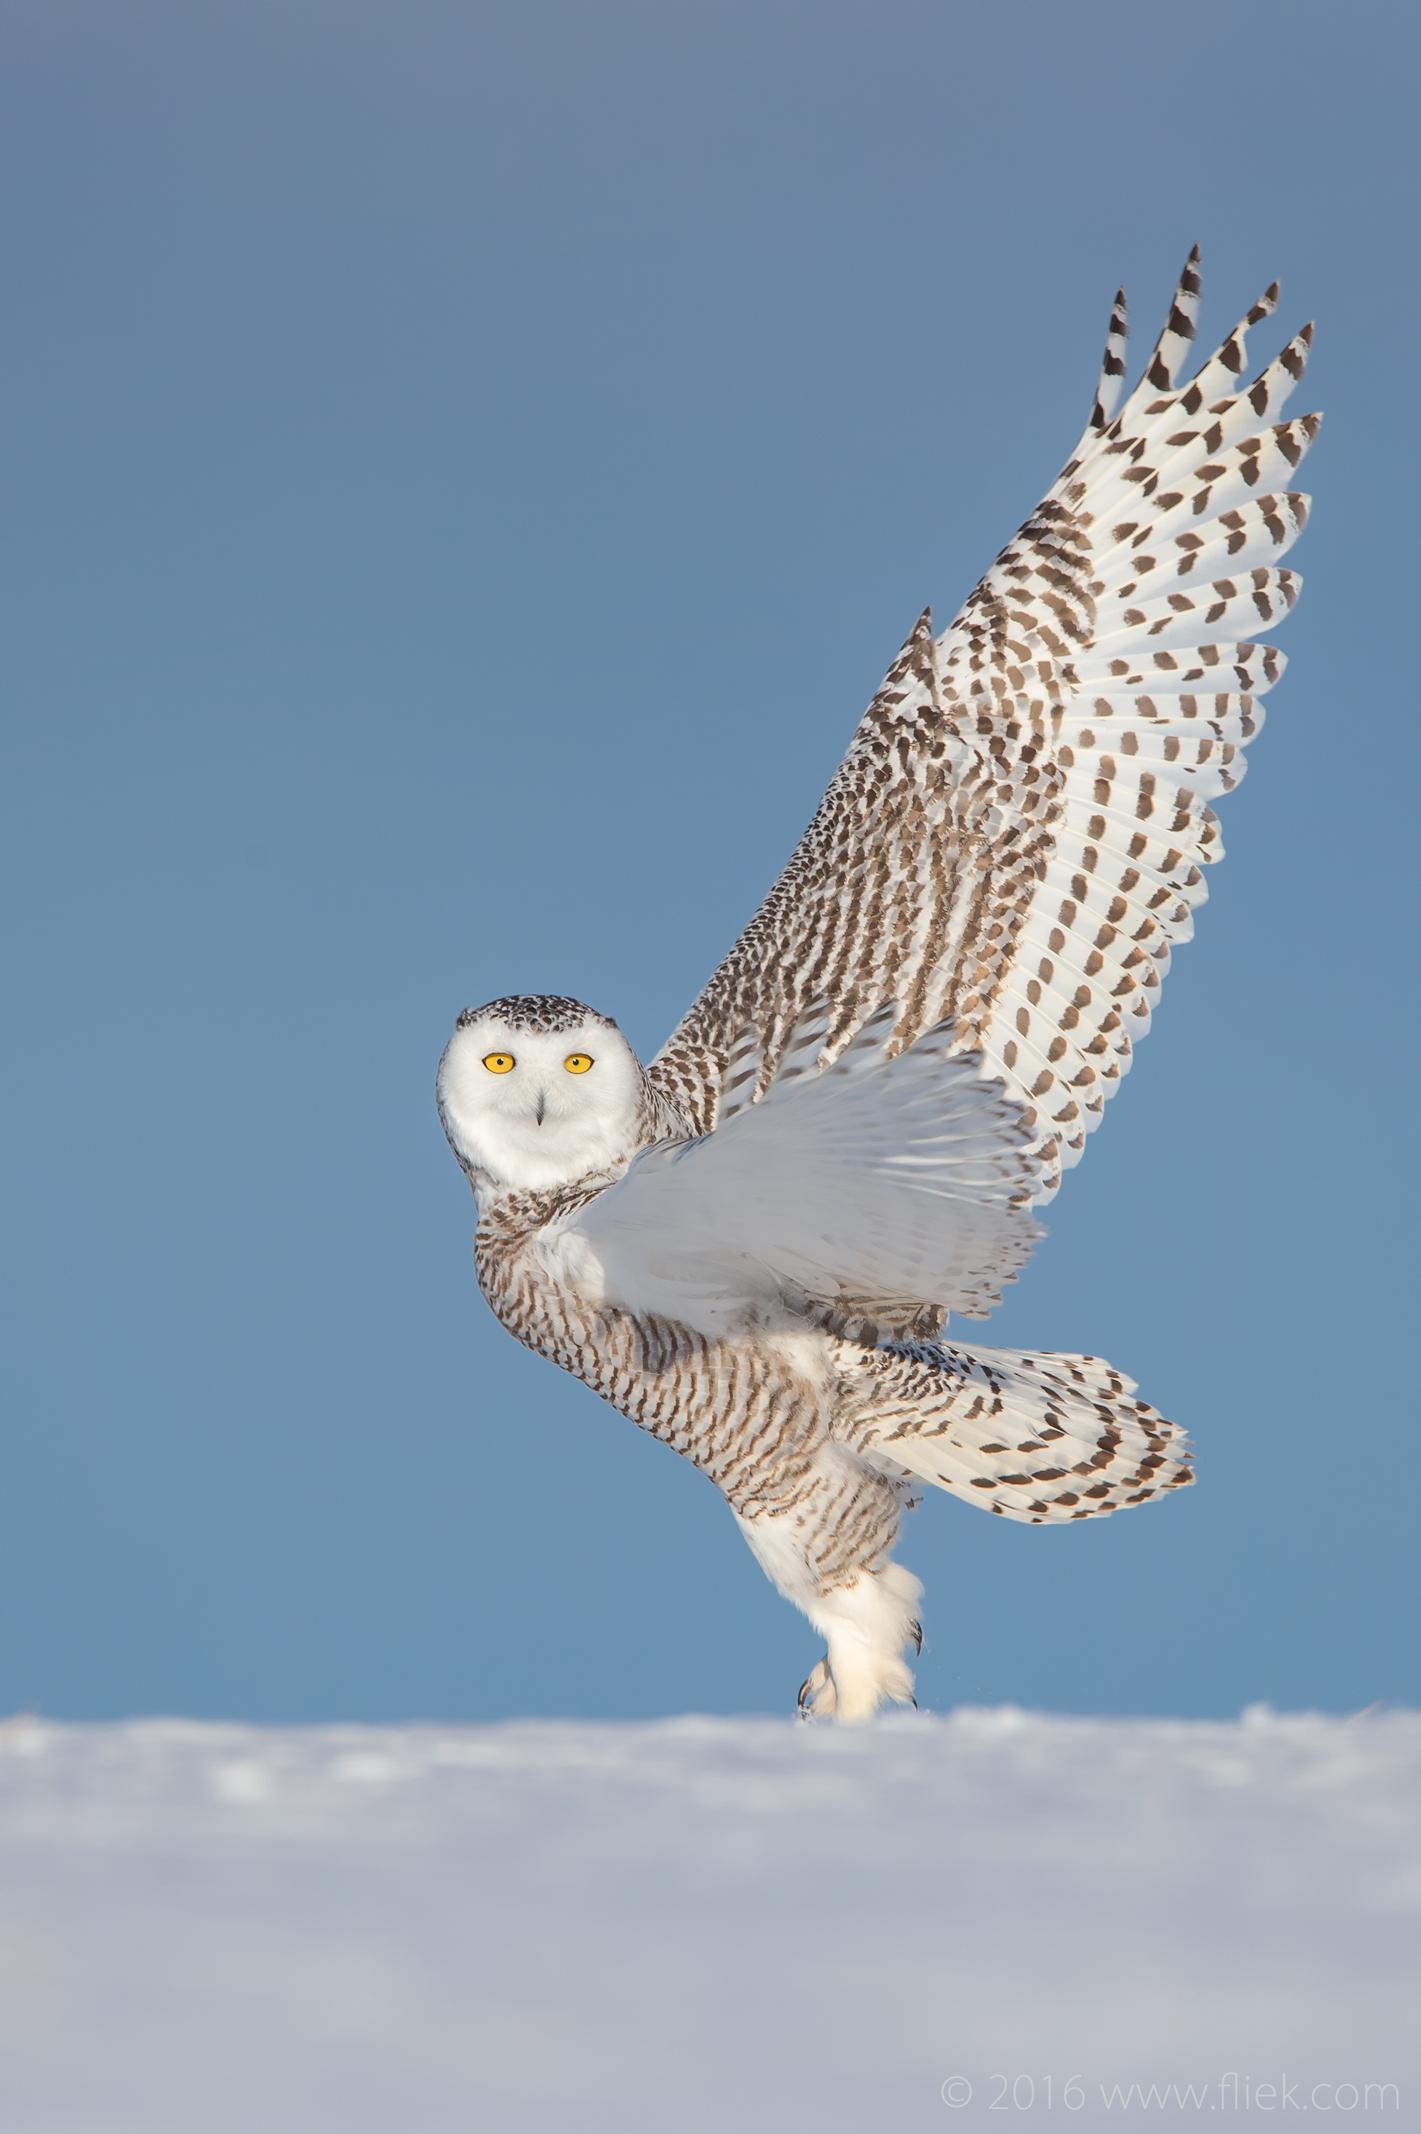 Snow Owl2-2-part1